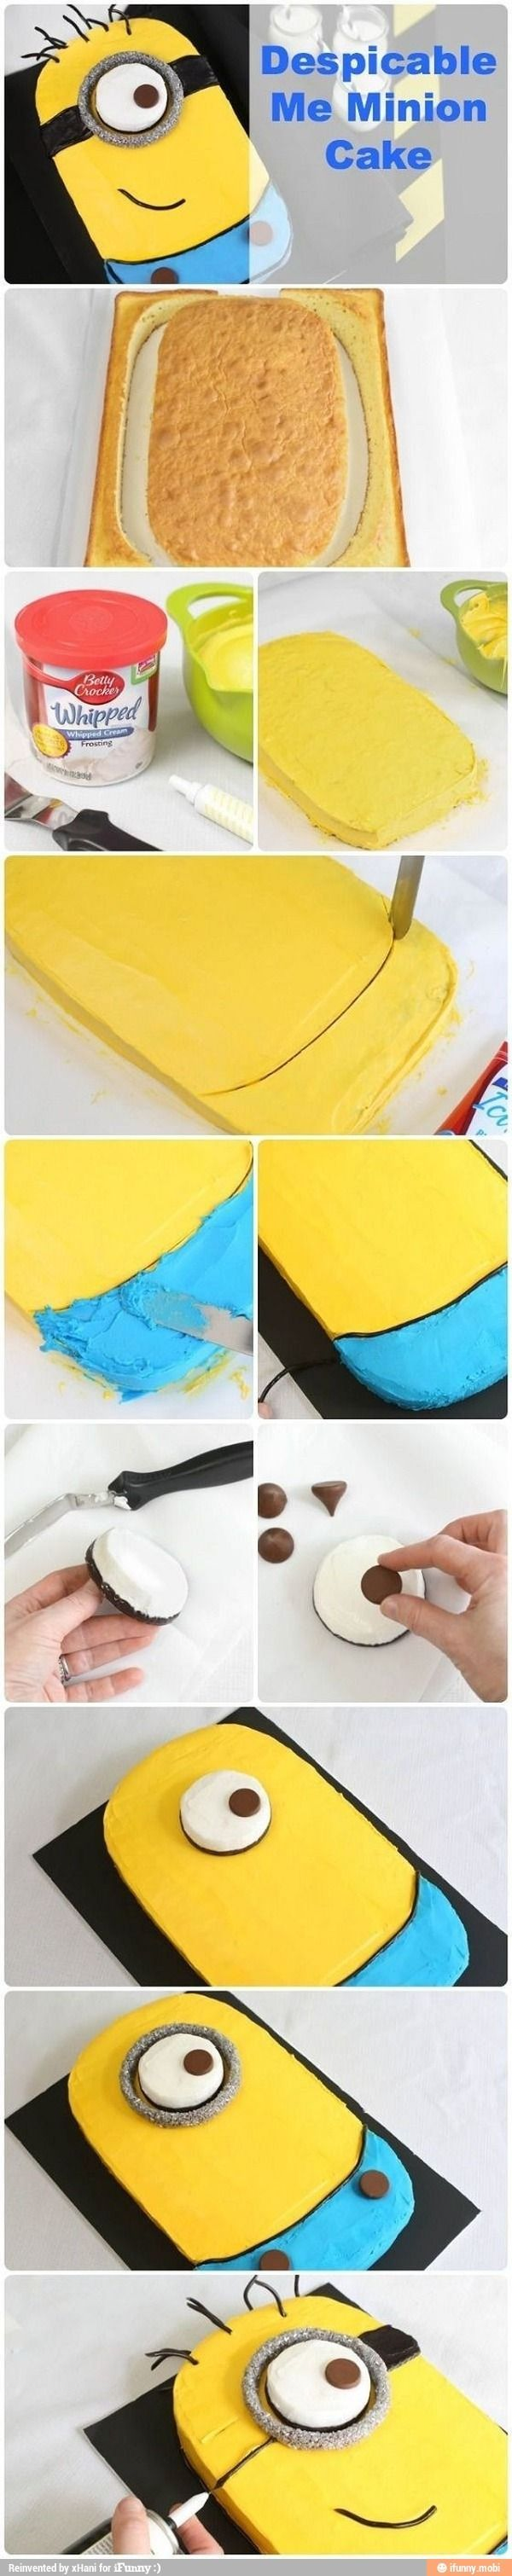 Despicable Me Minion cake / iFunny :) #food